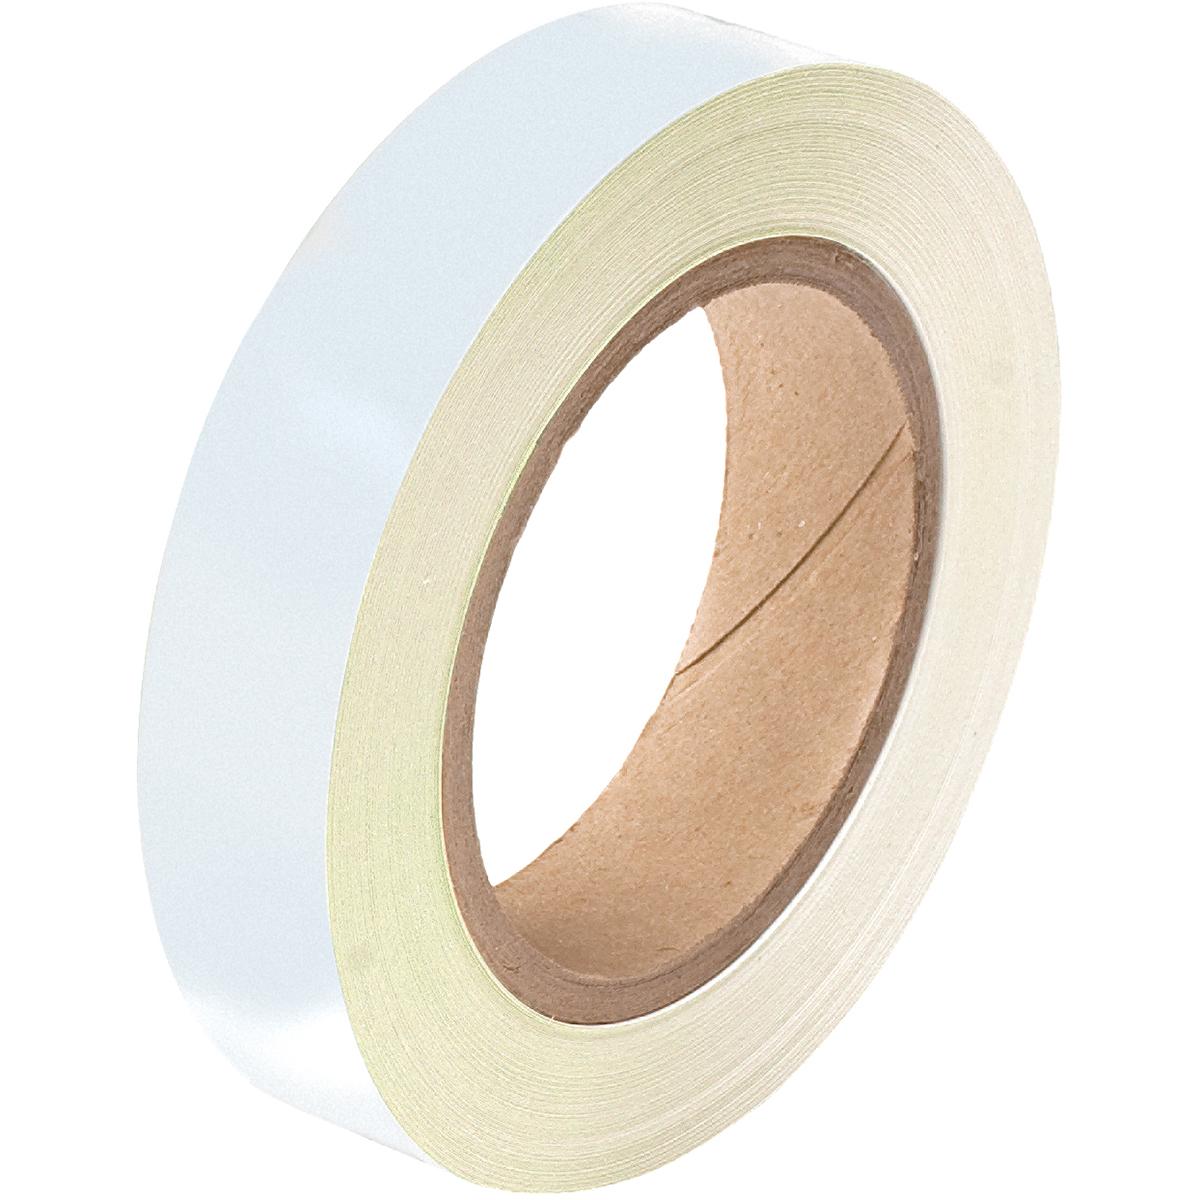 Pipe Banding Tape - White